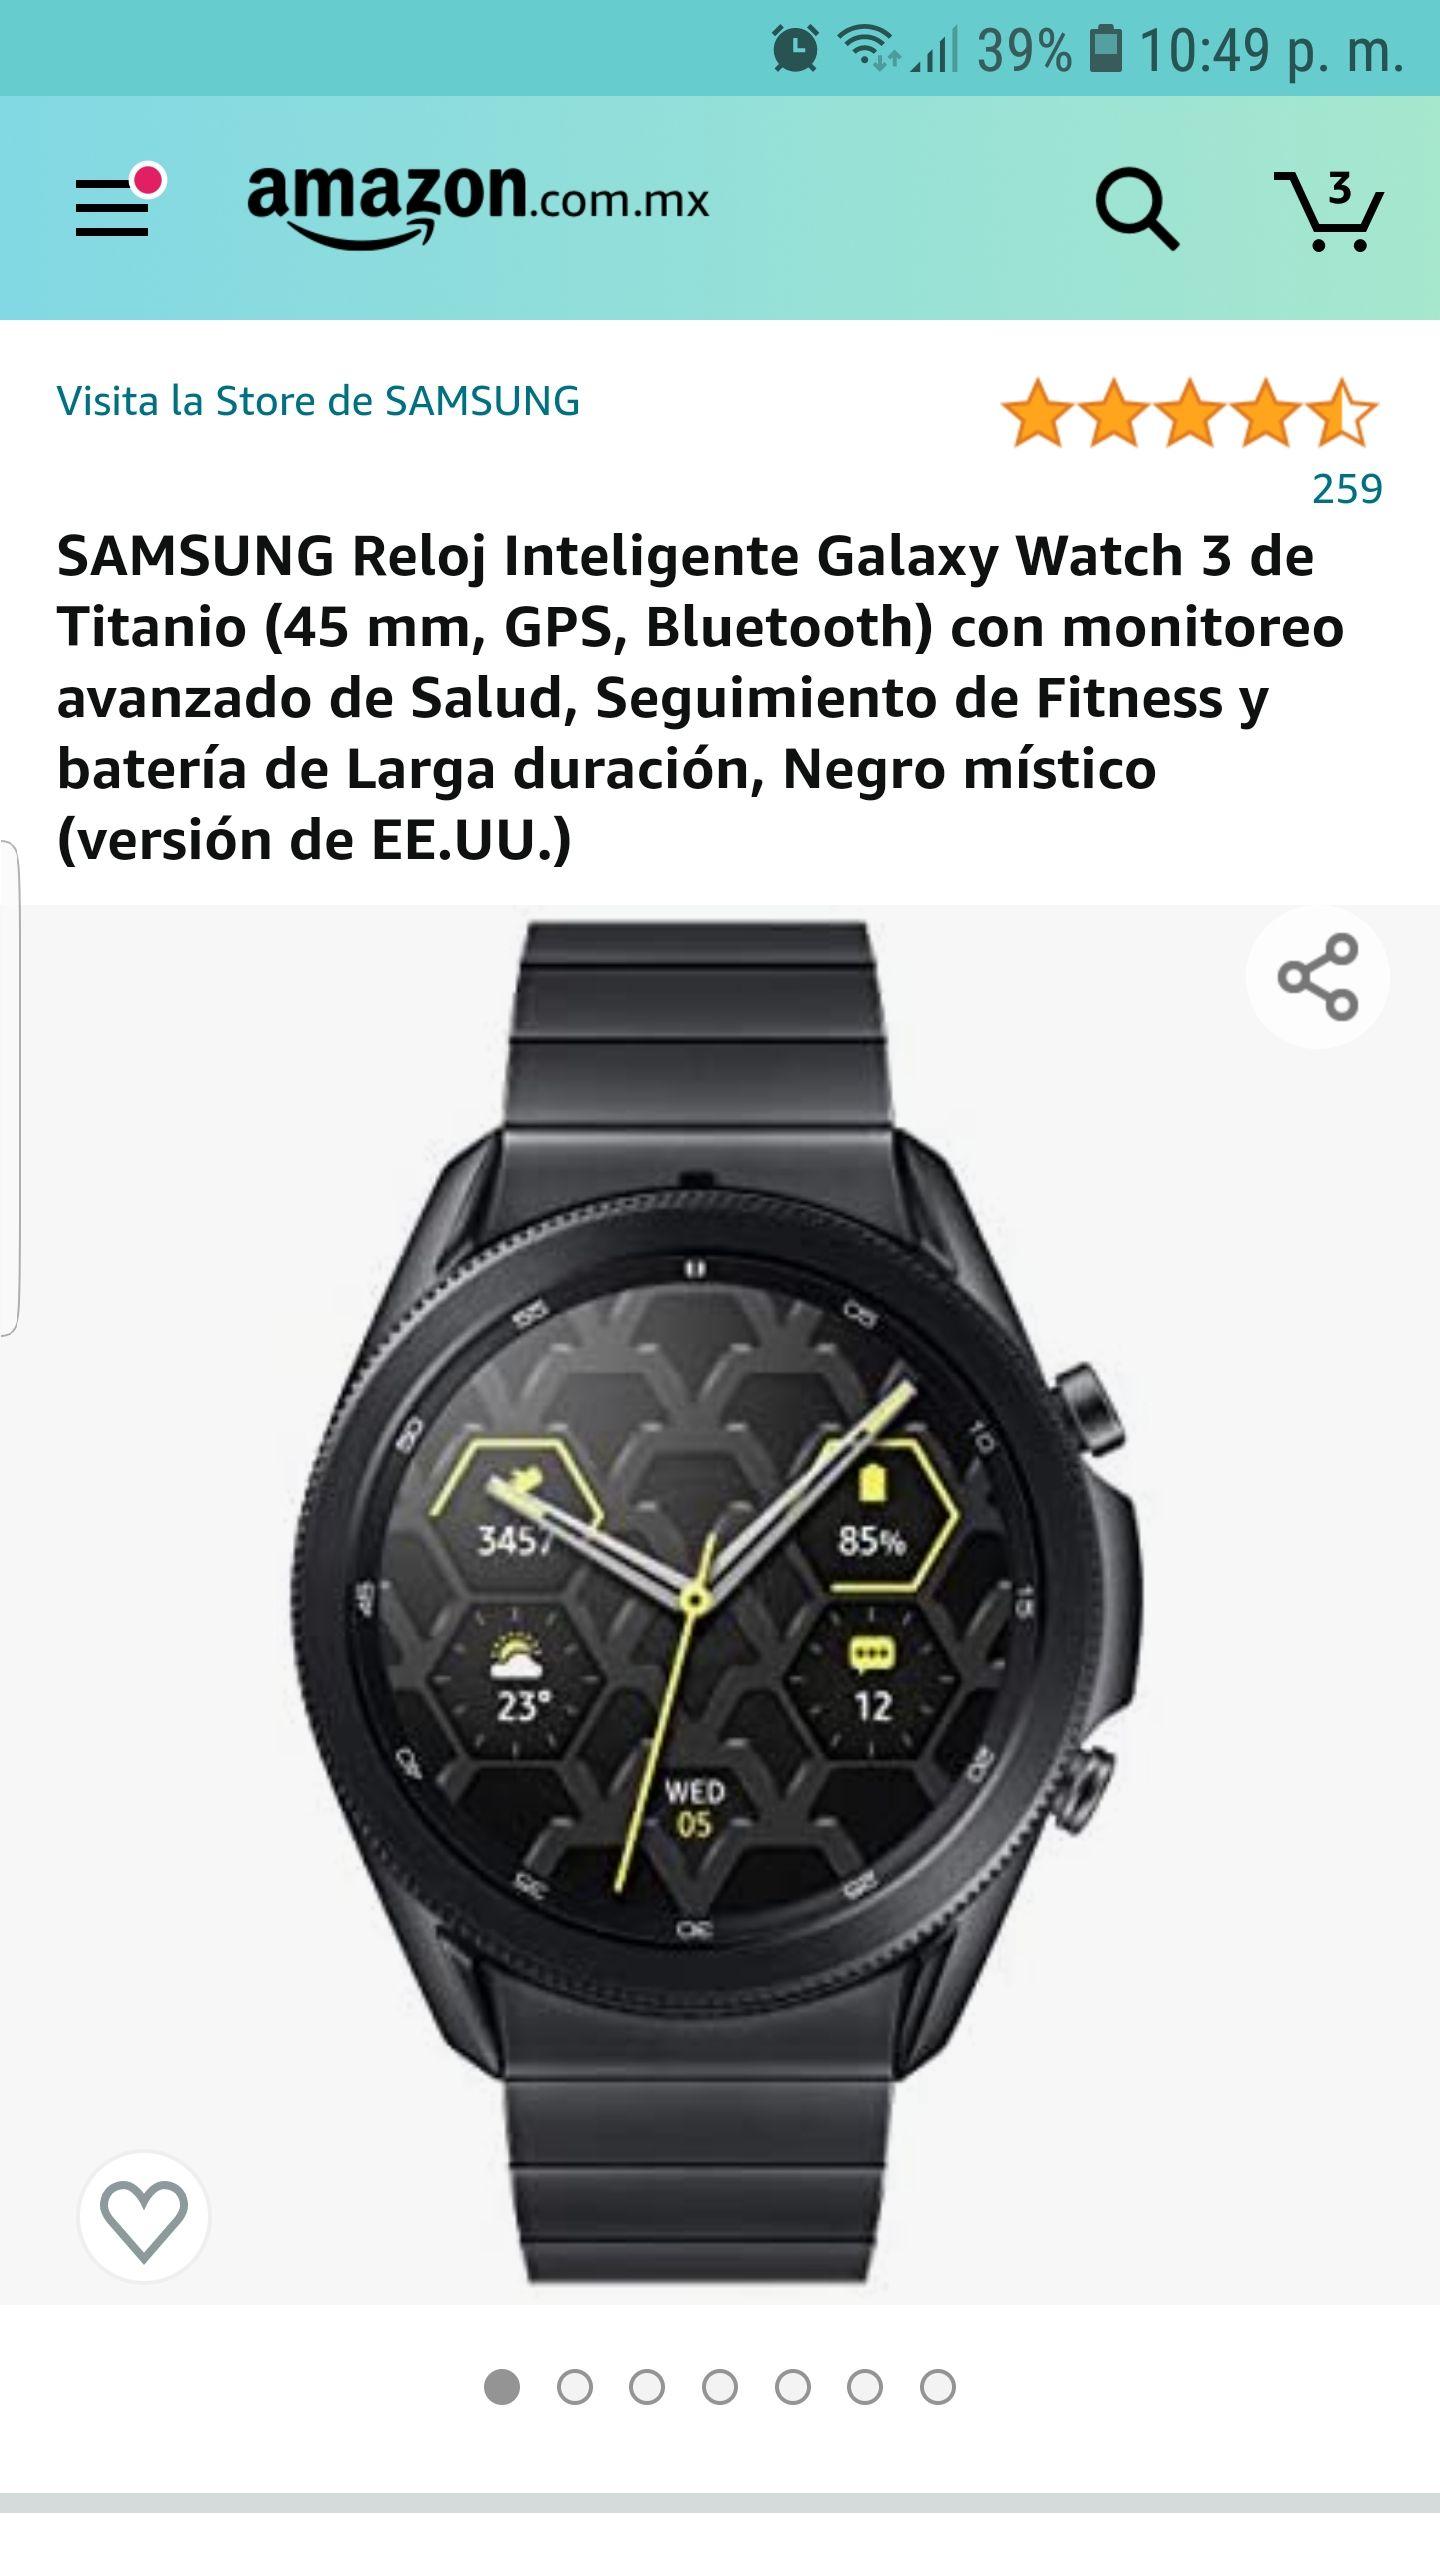 Amazon: SAMSUNG Reloj Inteligente Galaxy Watch 3 de Titanio